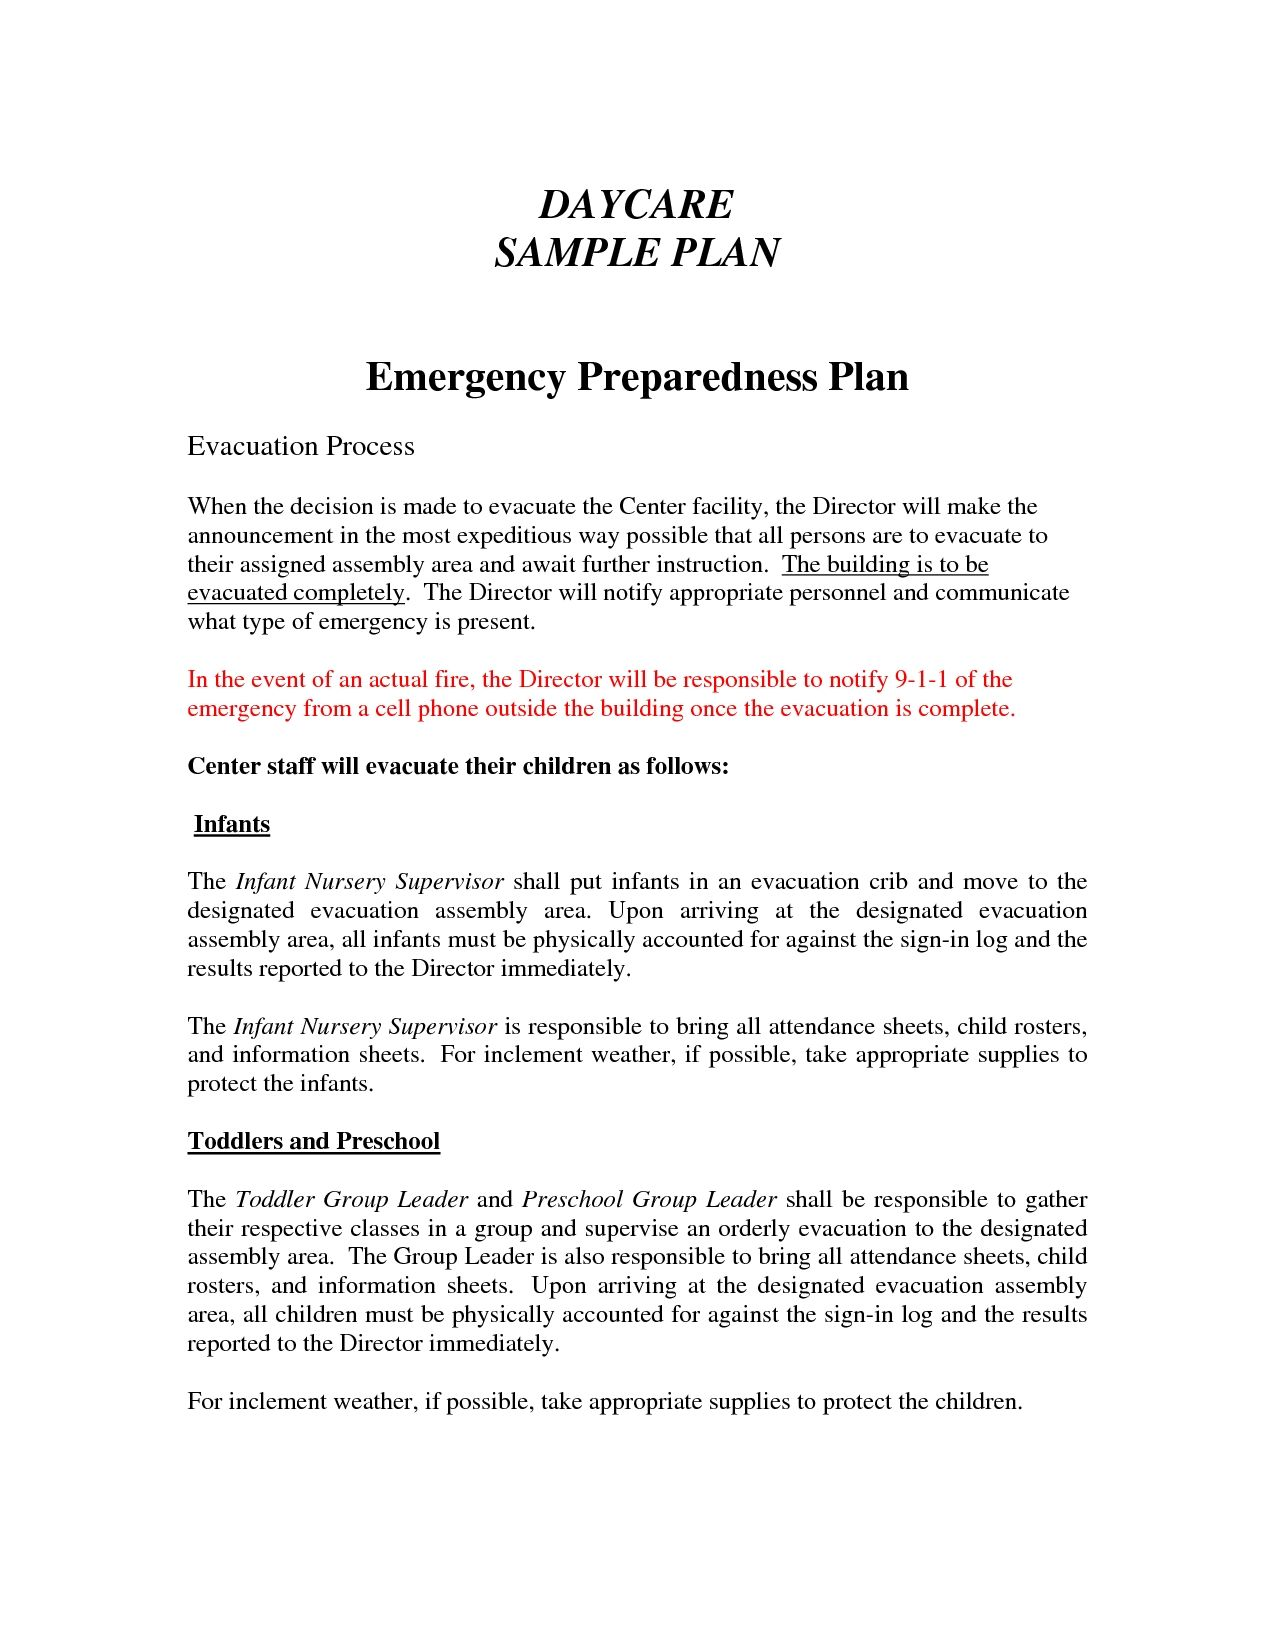 printable daycare emergency preparedness plan template